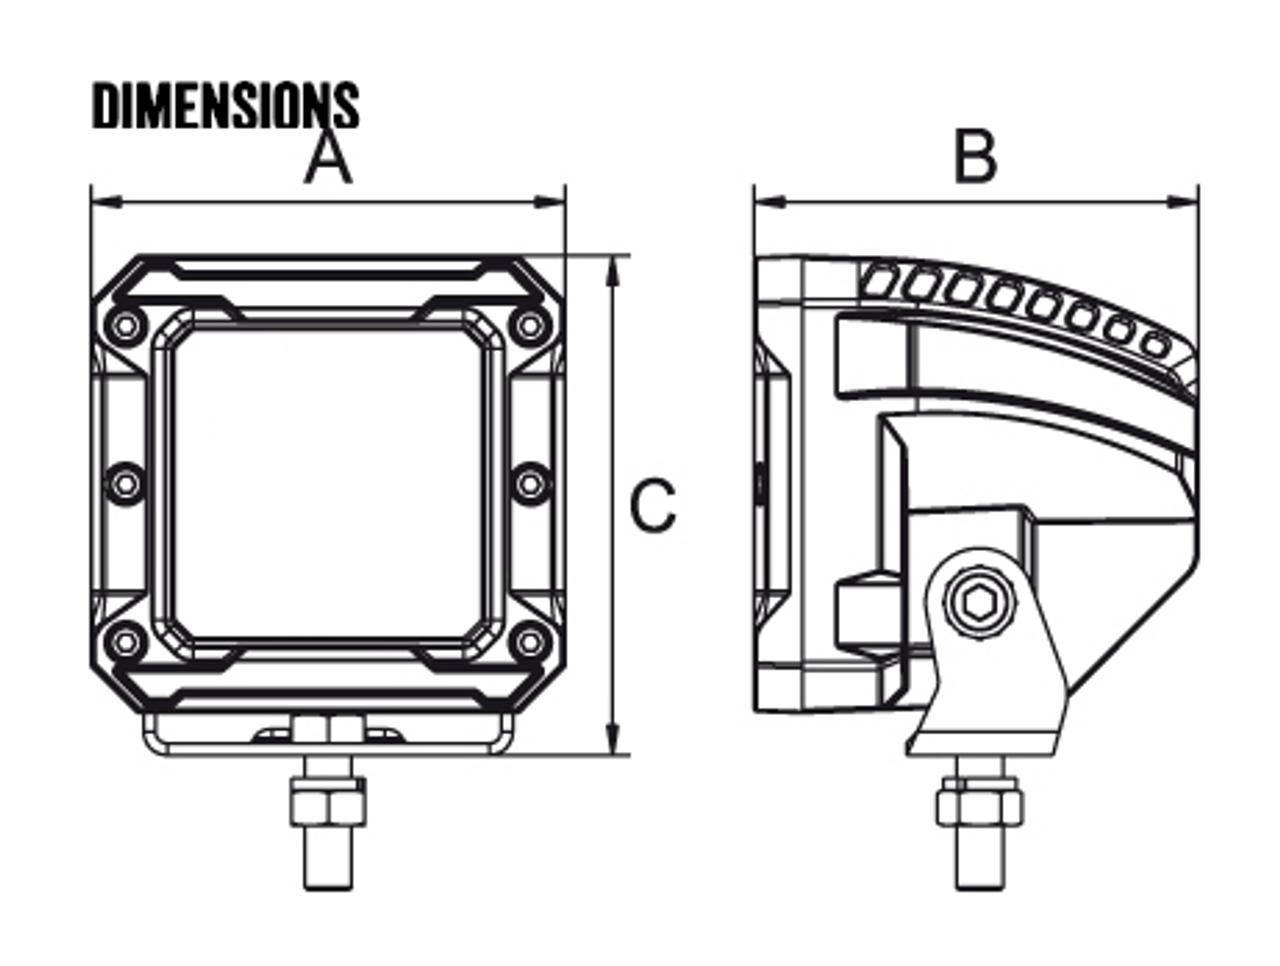 Line Drawing - RWL3618S - 3 Inch Square LED Spot Beam Work Light. 18 Watt. Multi-Volt 10 to 30 Volt DC. 5 Year Warranty. Spot Beam 12 watts. Roadvision. Ultimate LED.